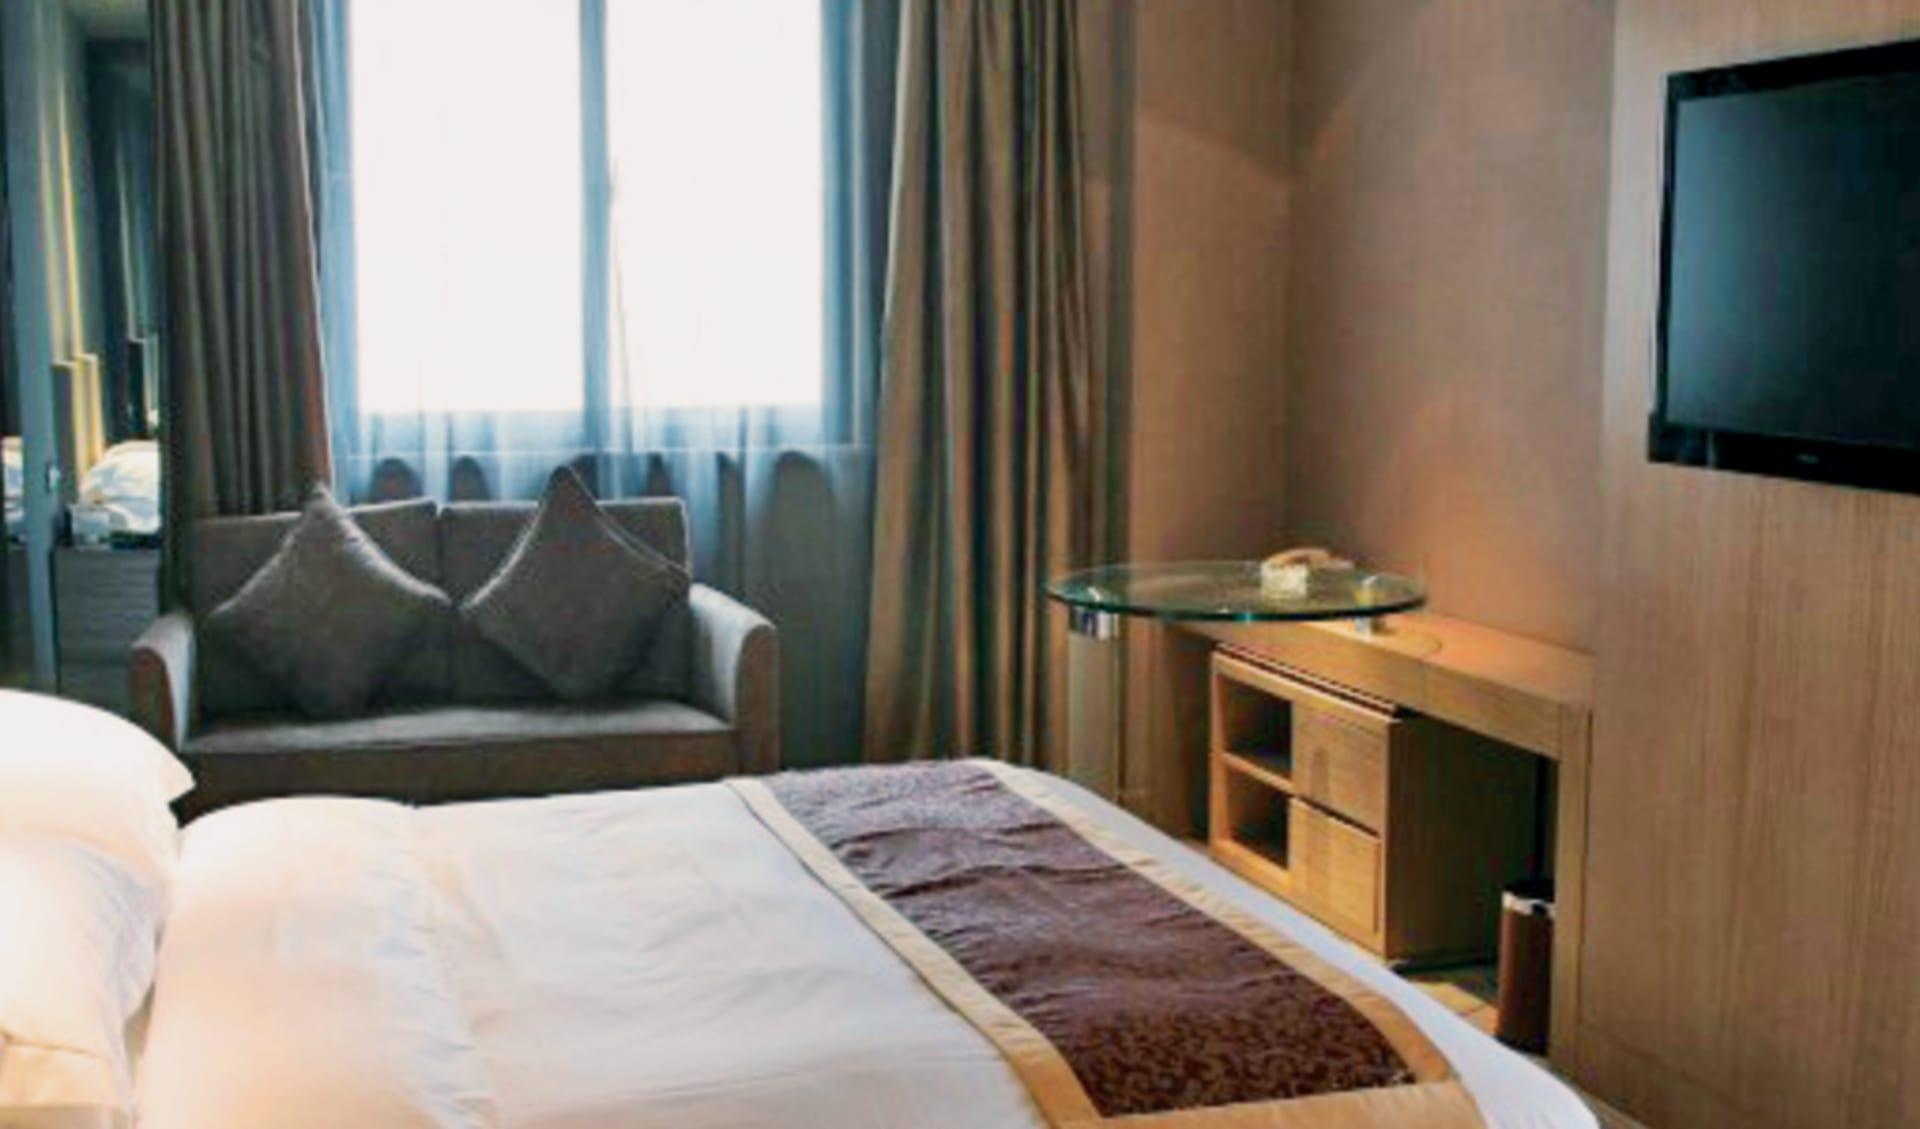 Hotel Ramada Bell Tower in Xian: Ramada-Xian-Bell-Tower-superior-king-room